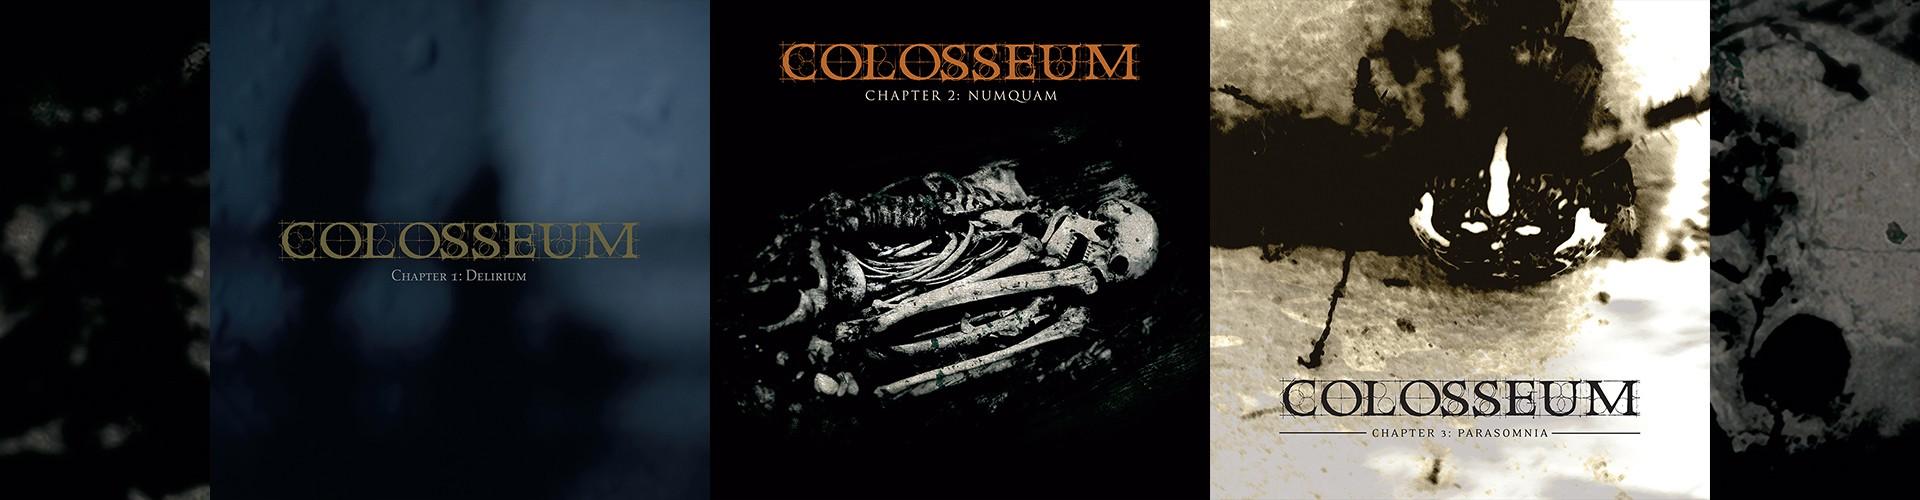 Colosseum vinyl